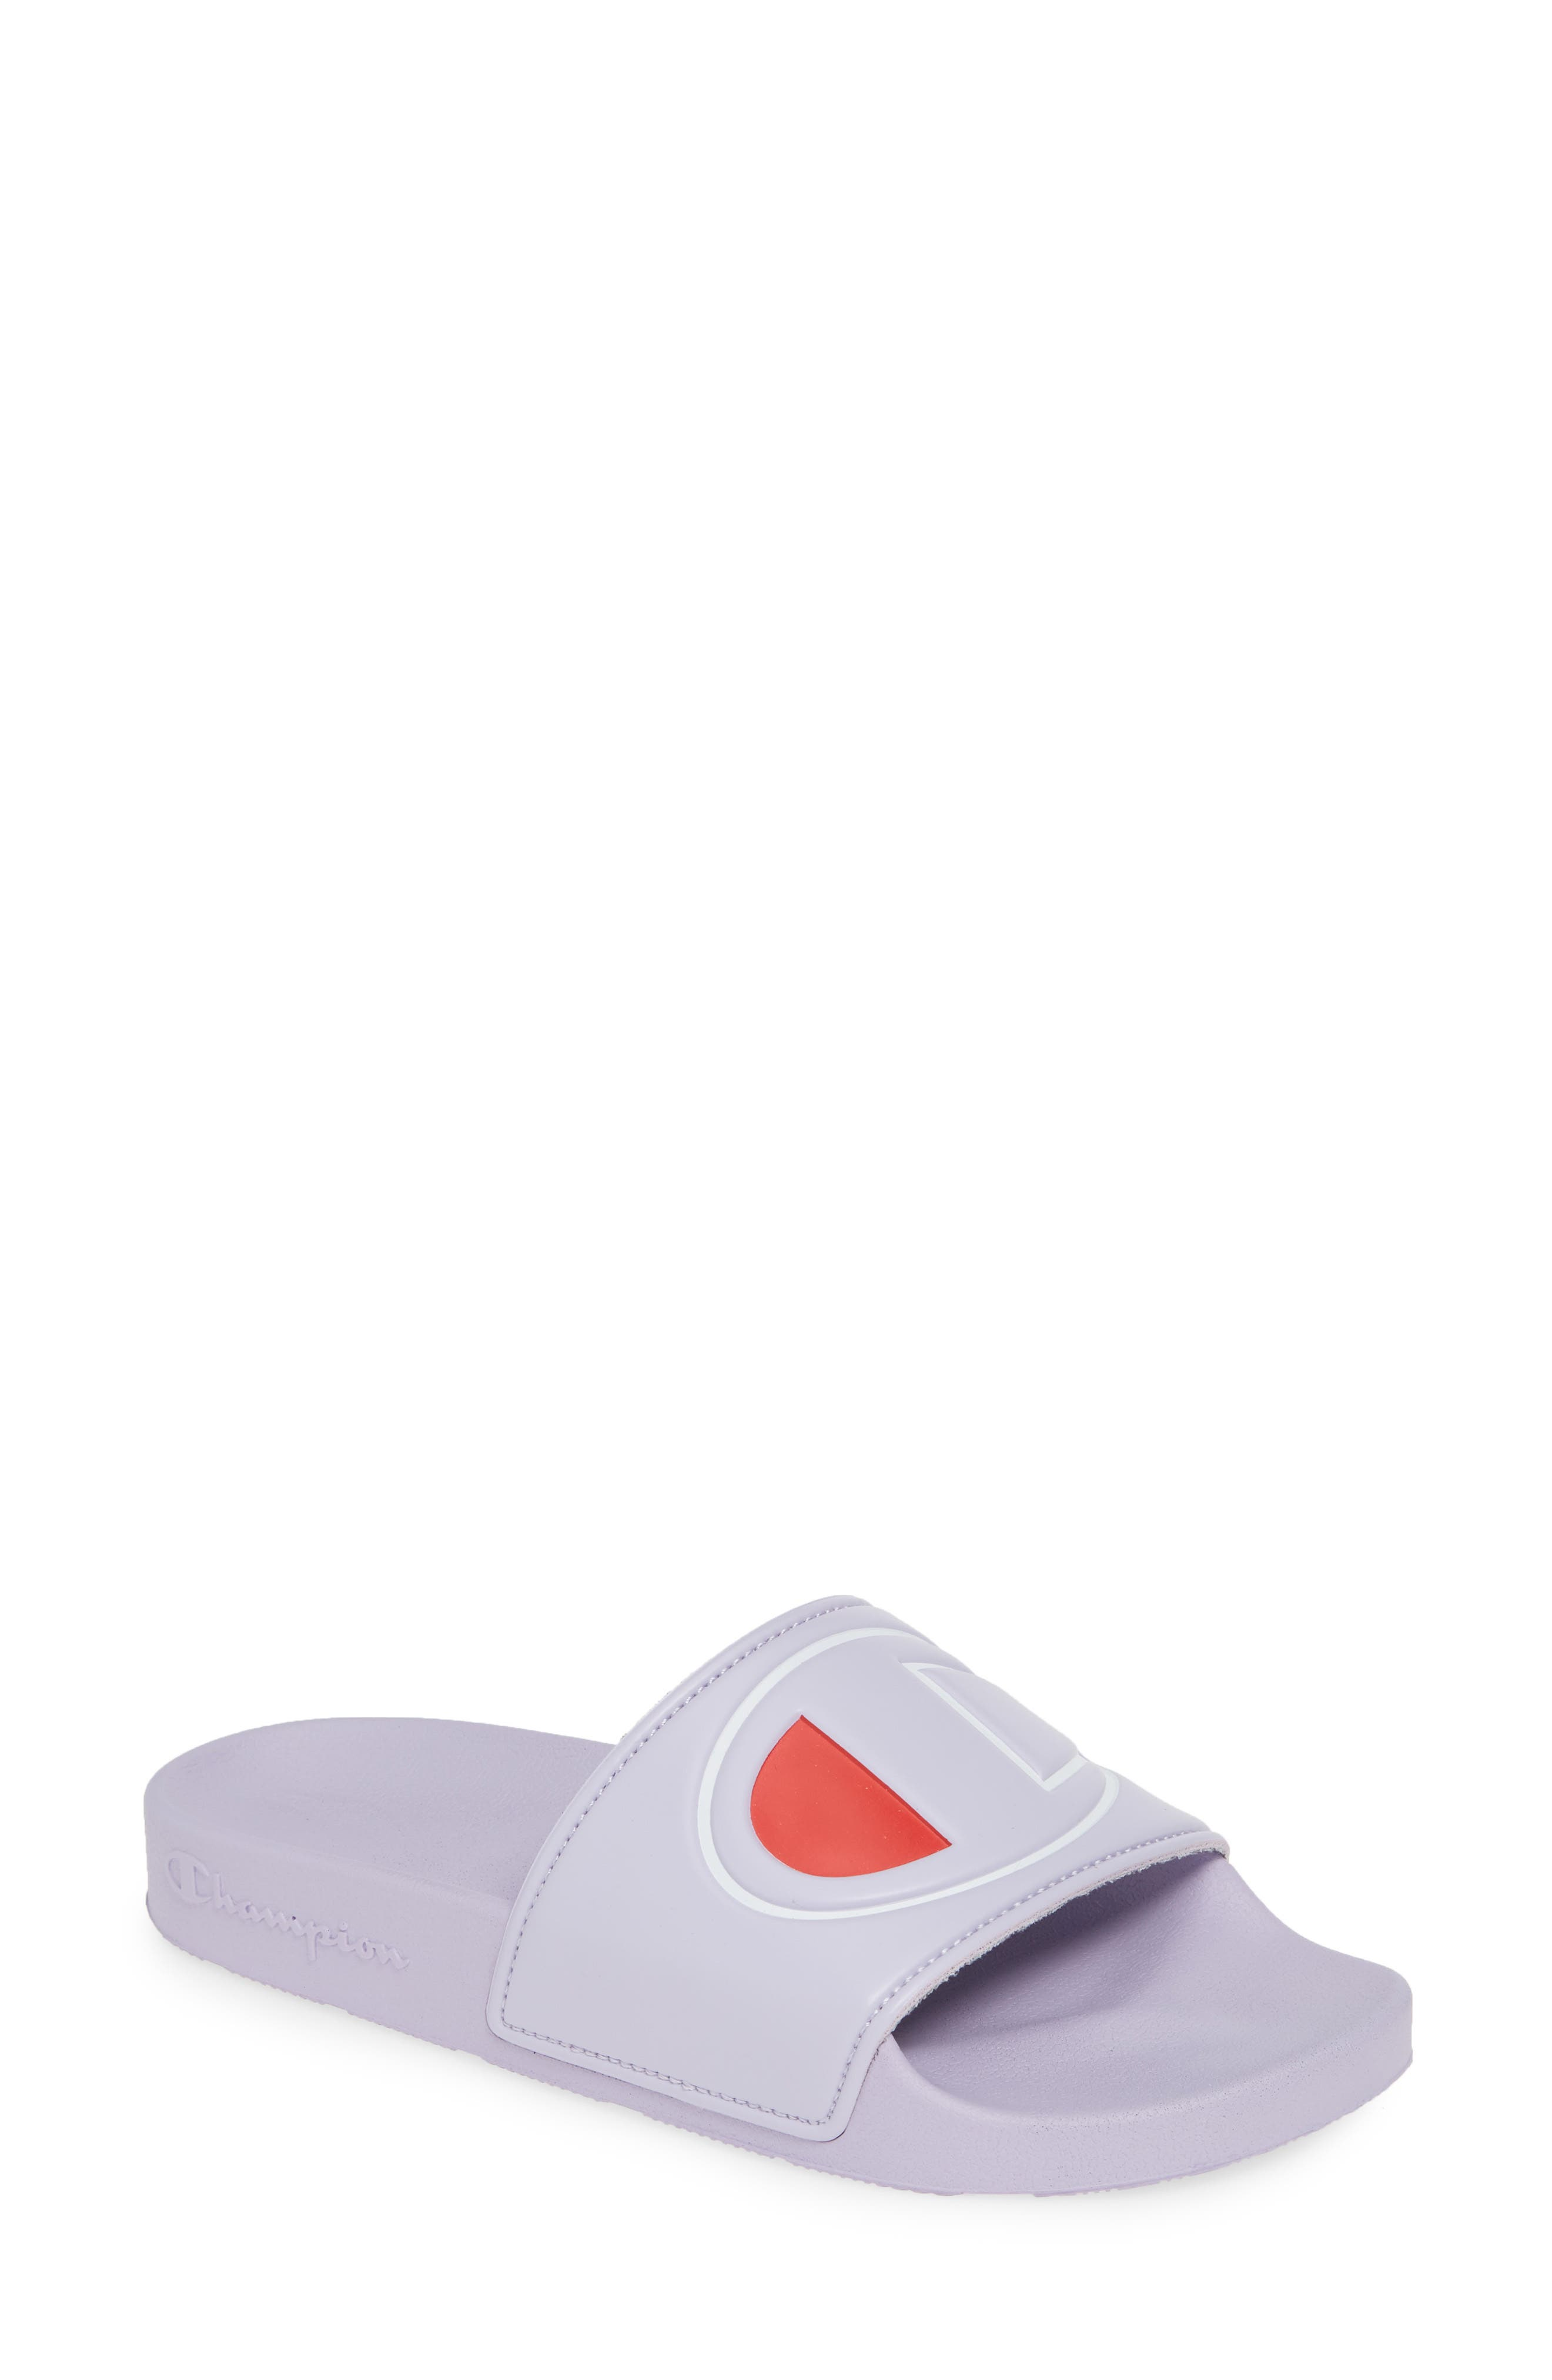 d4724c242c4 Women s Champion Pool Slide Sandals